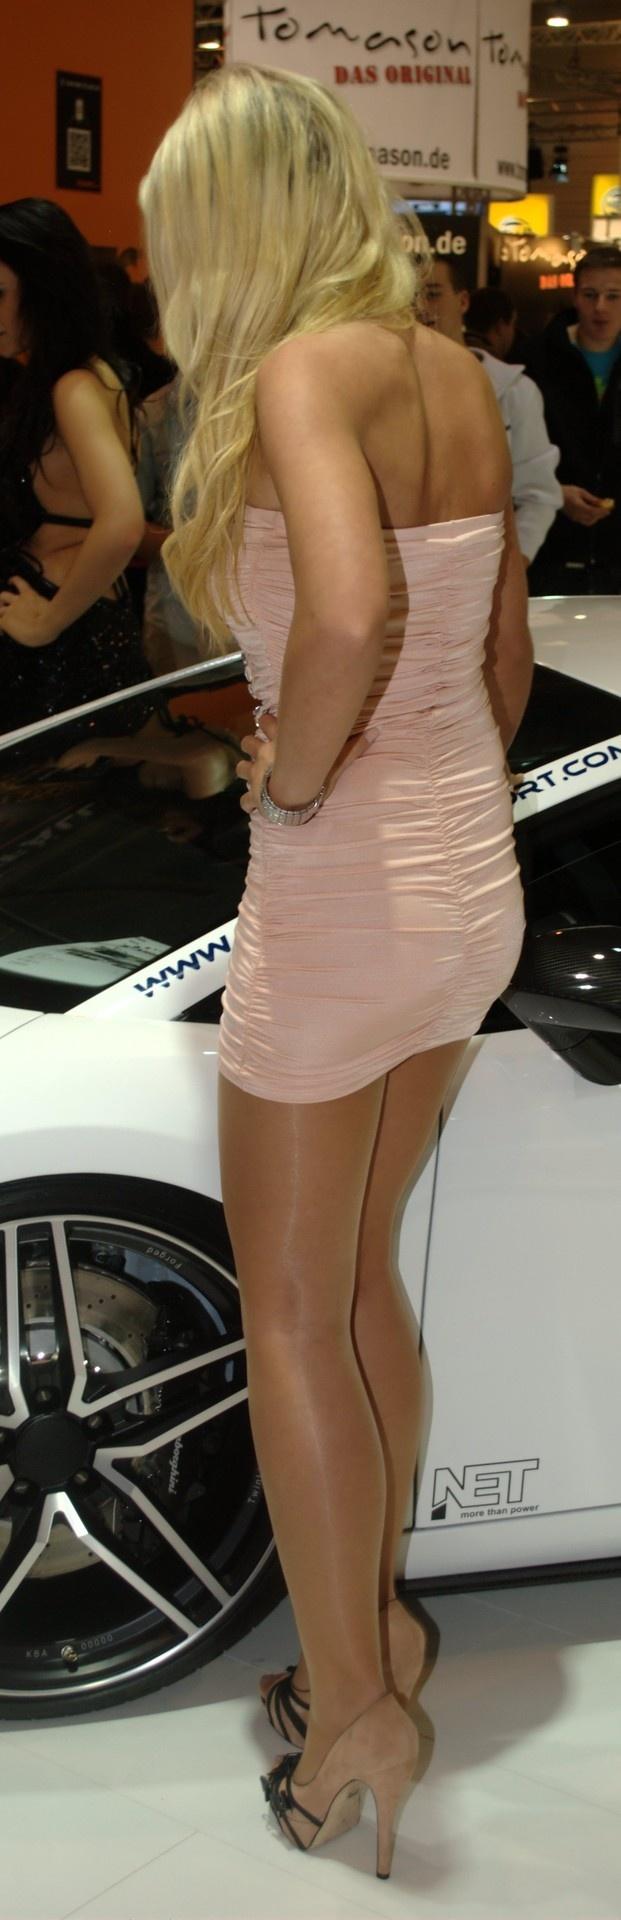 As seen on Legs.BZ website. | Anna selezneva, Vogue paris